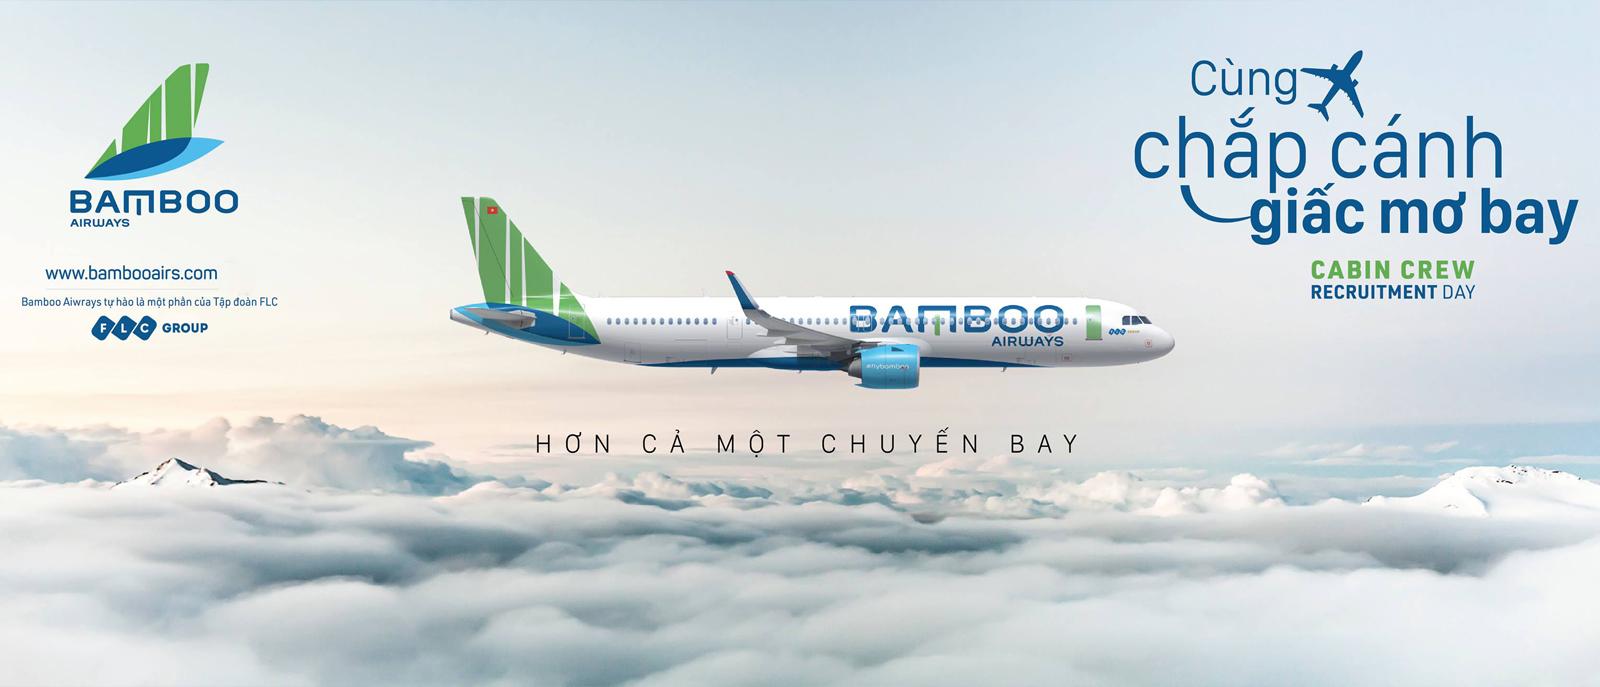 Mua bán cổ phiếu Bamboo Airways BAV, Giá cổ phiếu BAV, Giá cổ phiếu Bamboo Airways